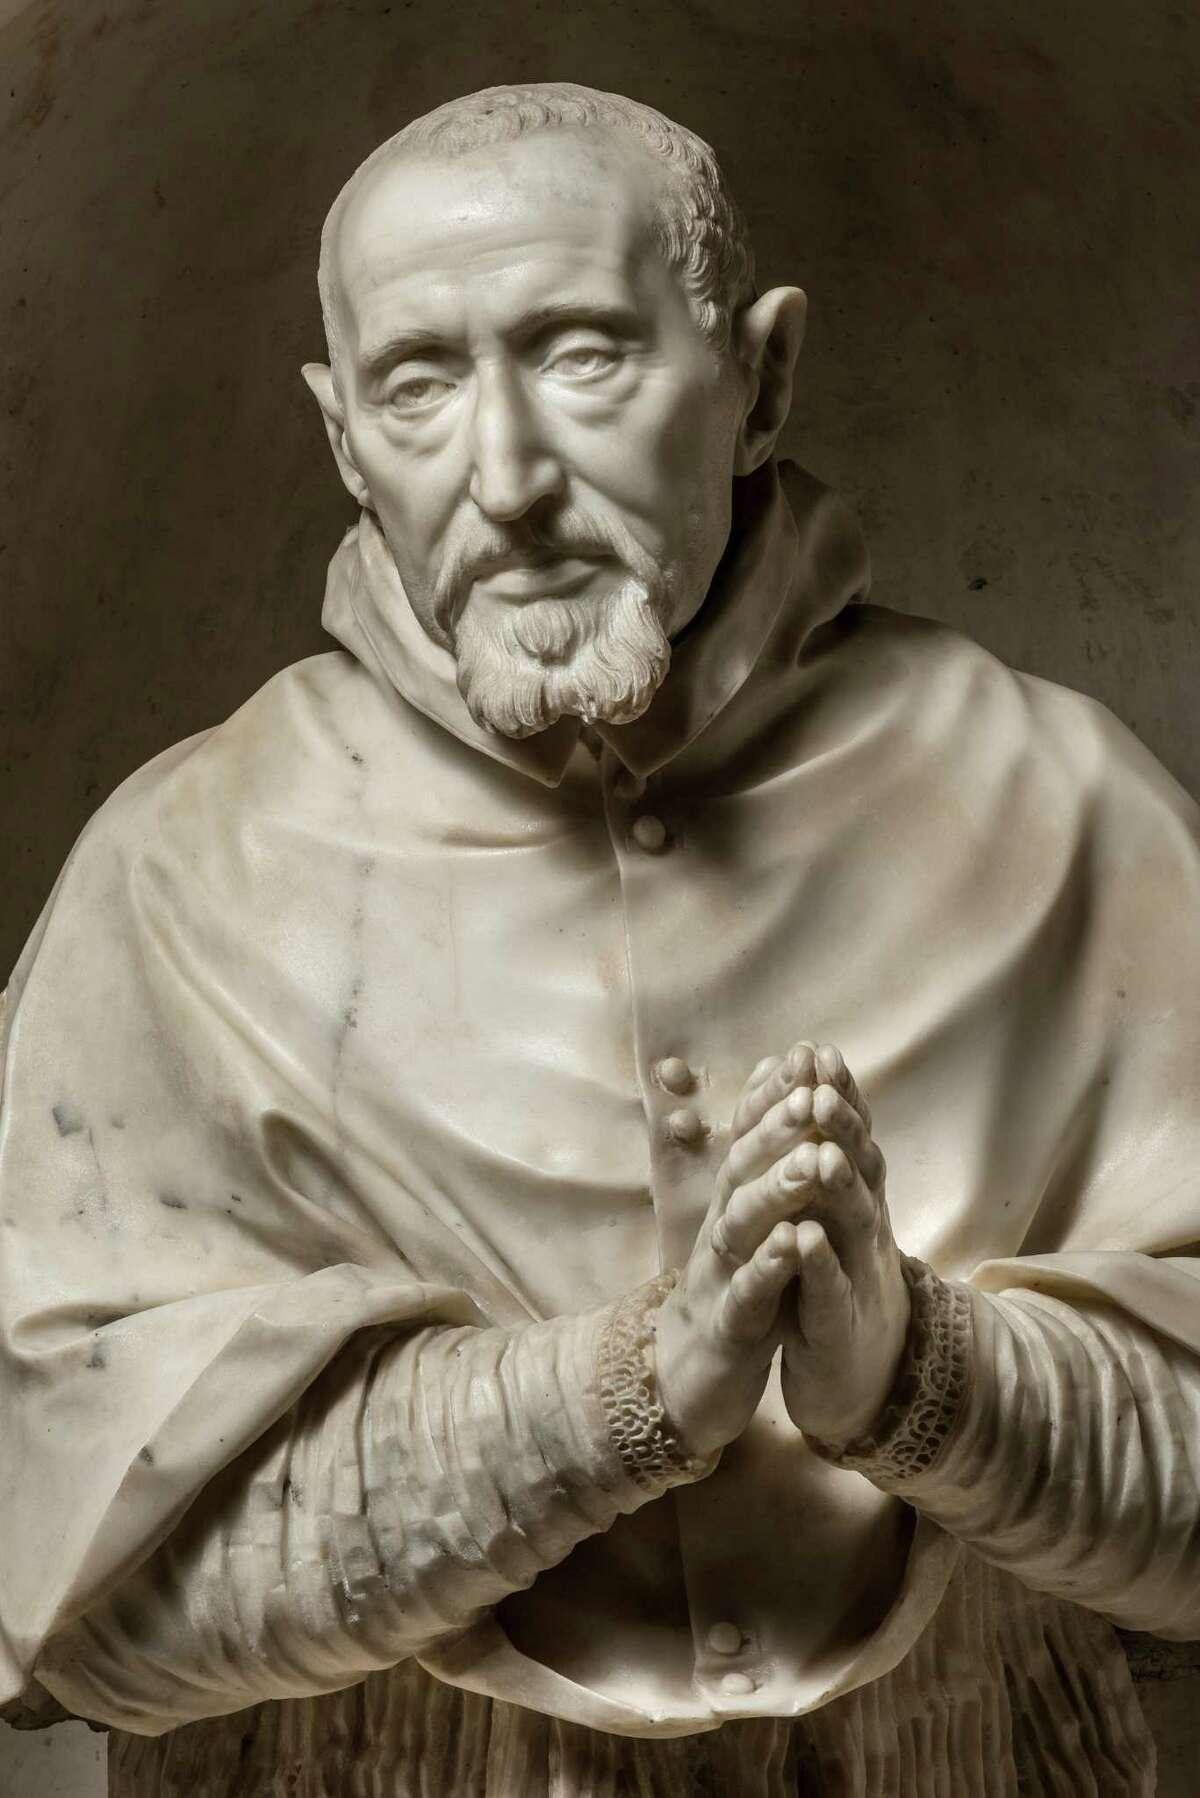 The late Italian artist Gian Lorenzo Bernini's bust of Cardinal Roberto Bellarmino is the highlight of the exhibit,